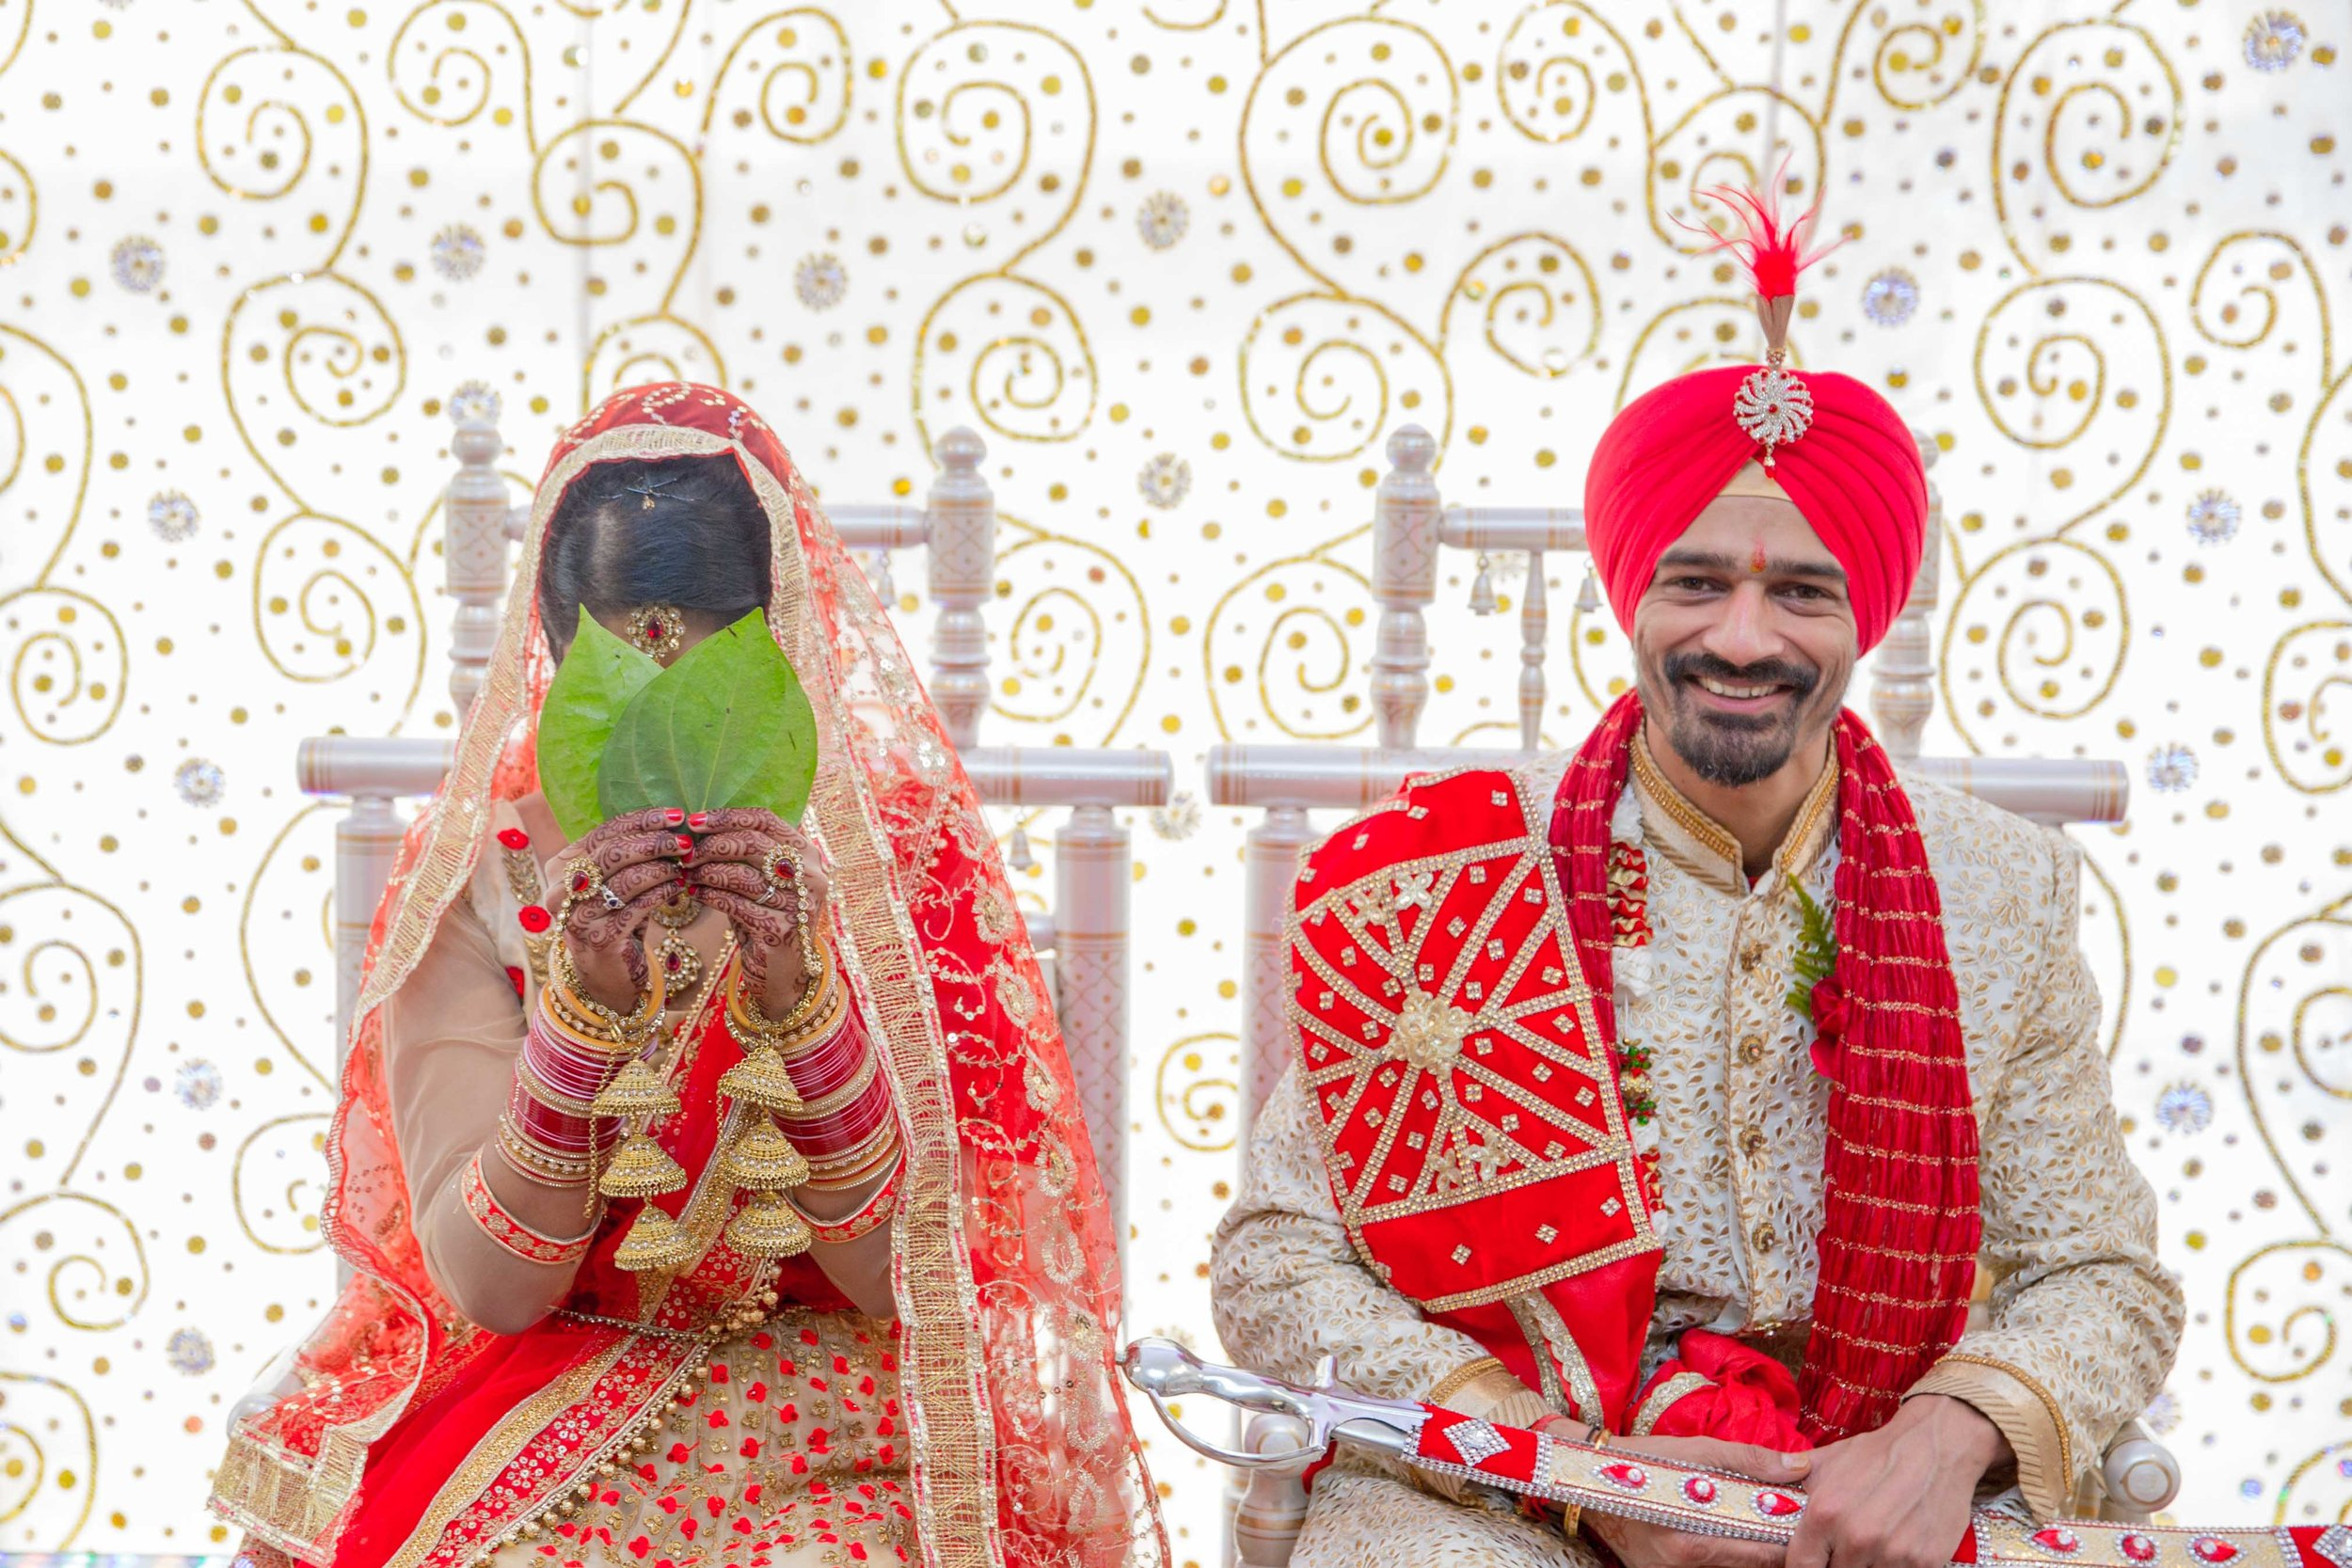 ramada-park-hall-hotel-birmingham-wolverhampton-hindu-wedding-asian-wedding-photography-natalia-smith-photography-21.jpg